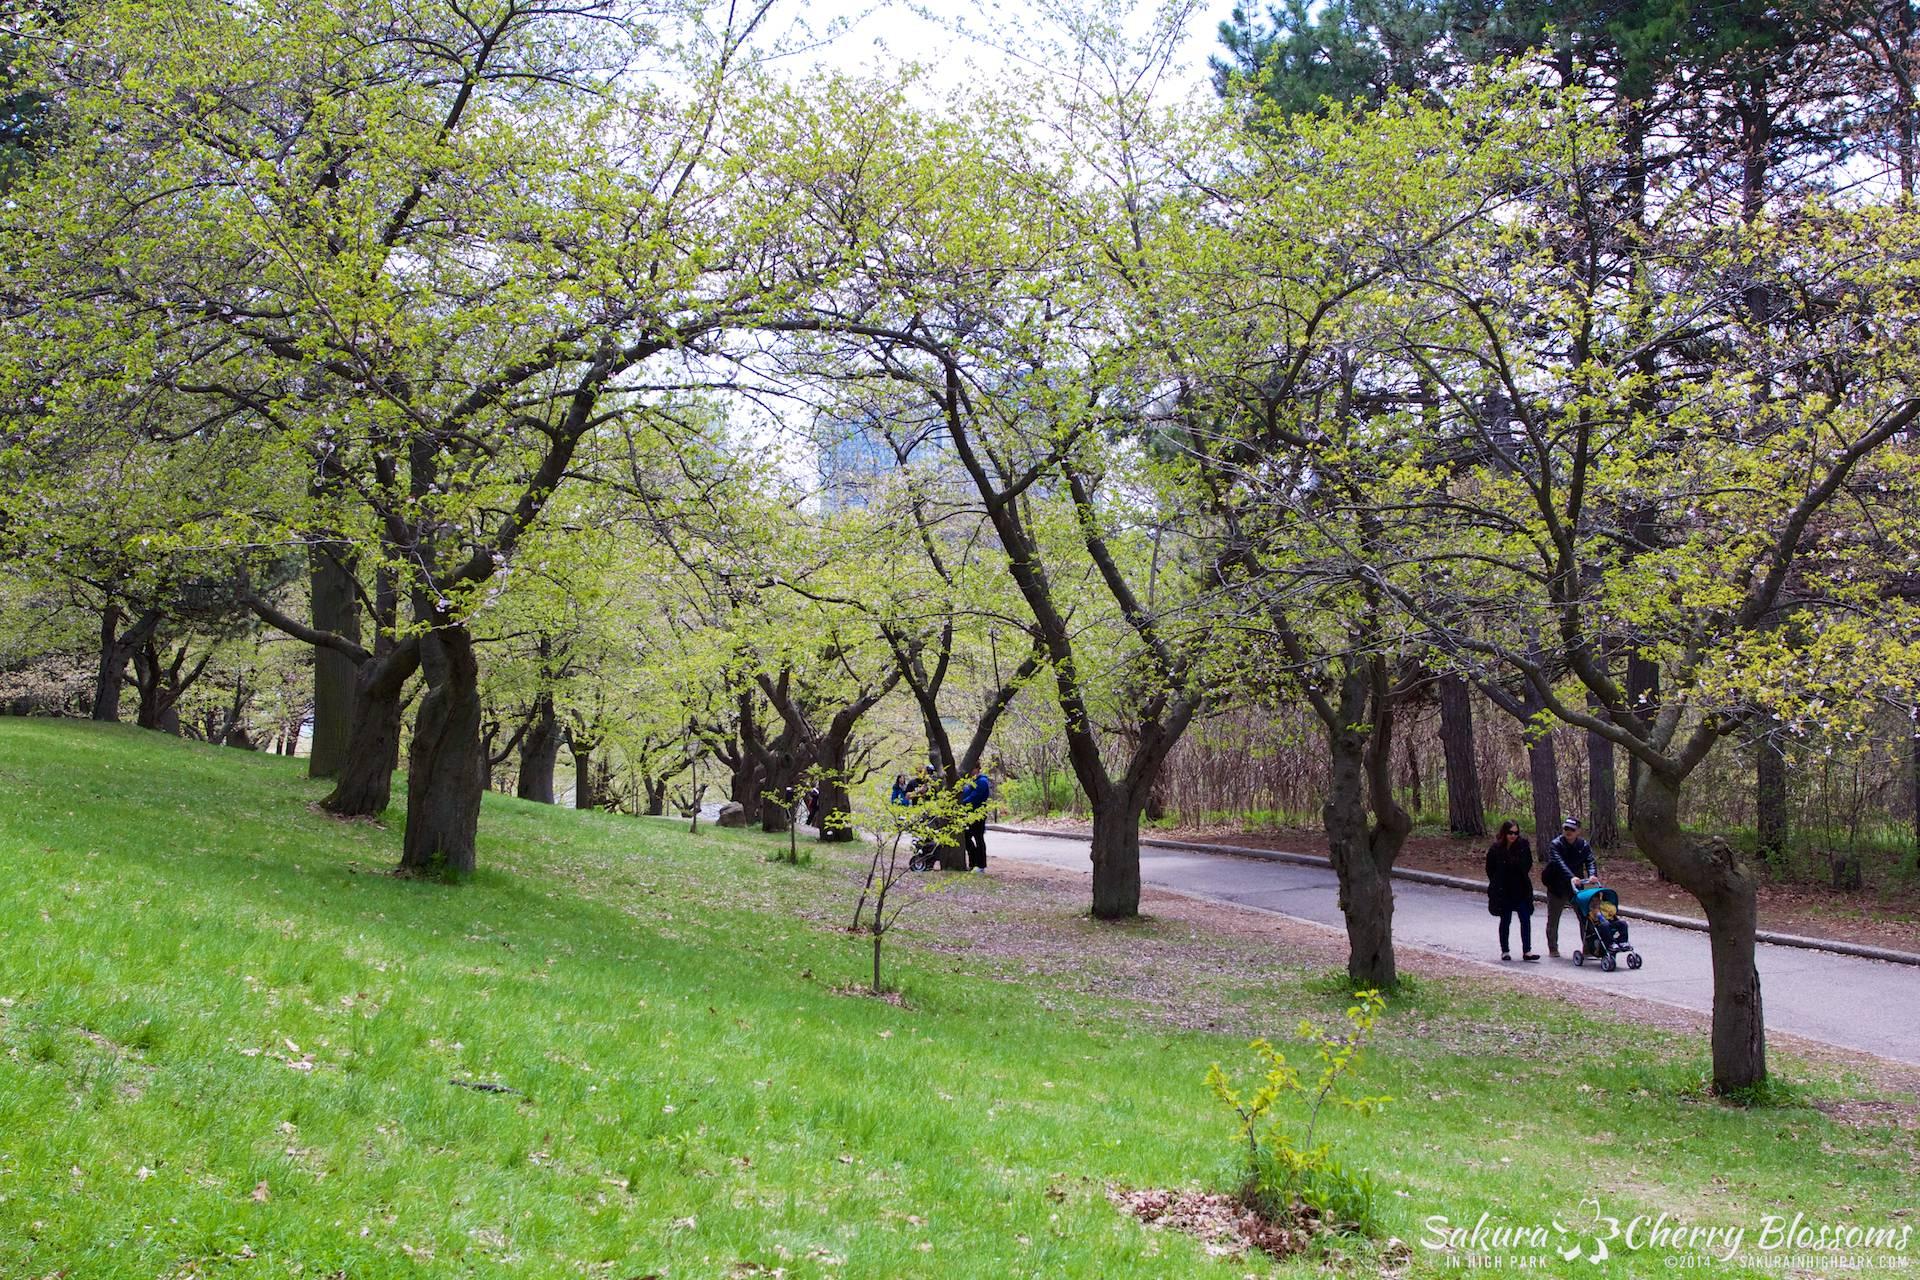 SakuraInHighPark-May1614-480.jpg